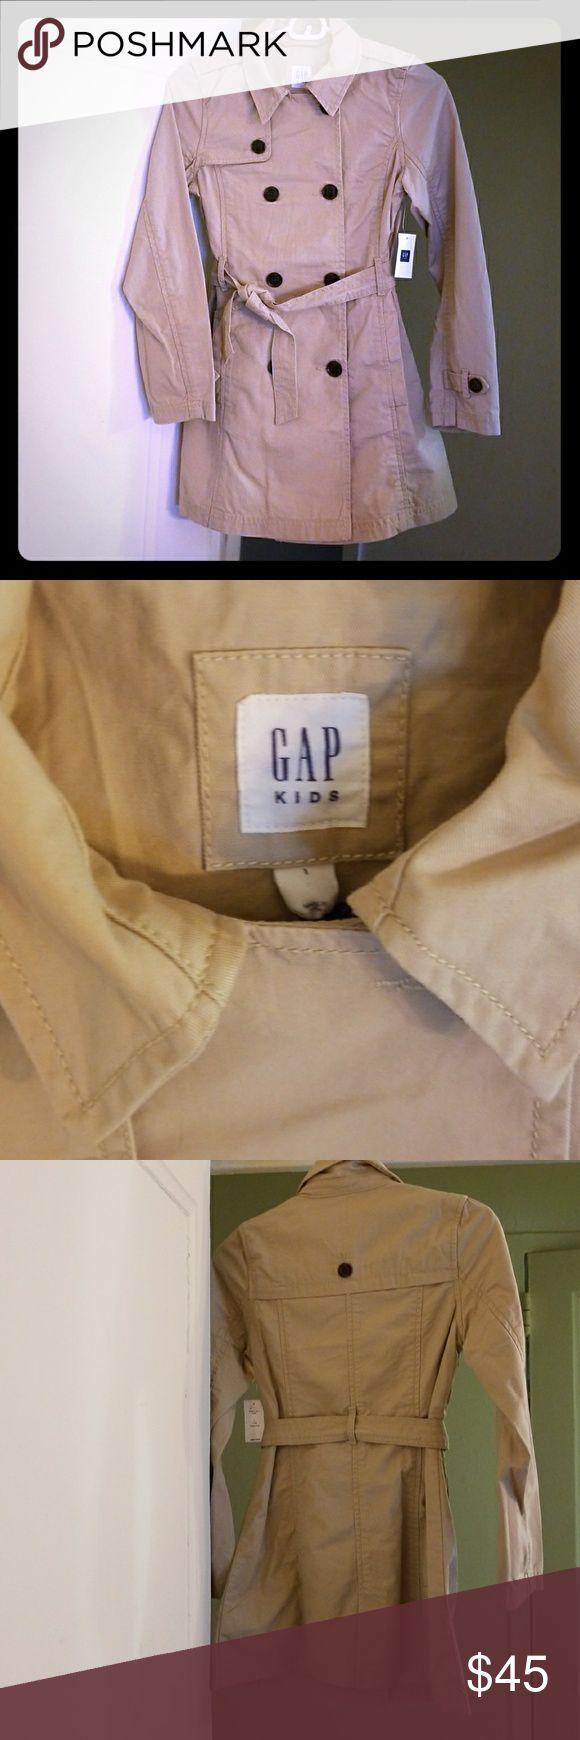 NWT GAP GIRLS TRENCH COAT, SIZE LARGE Brand new beautiful trench coat GAP Jackets & Coats